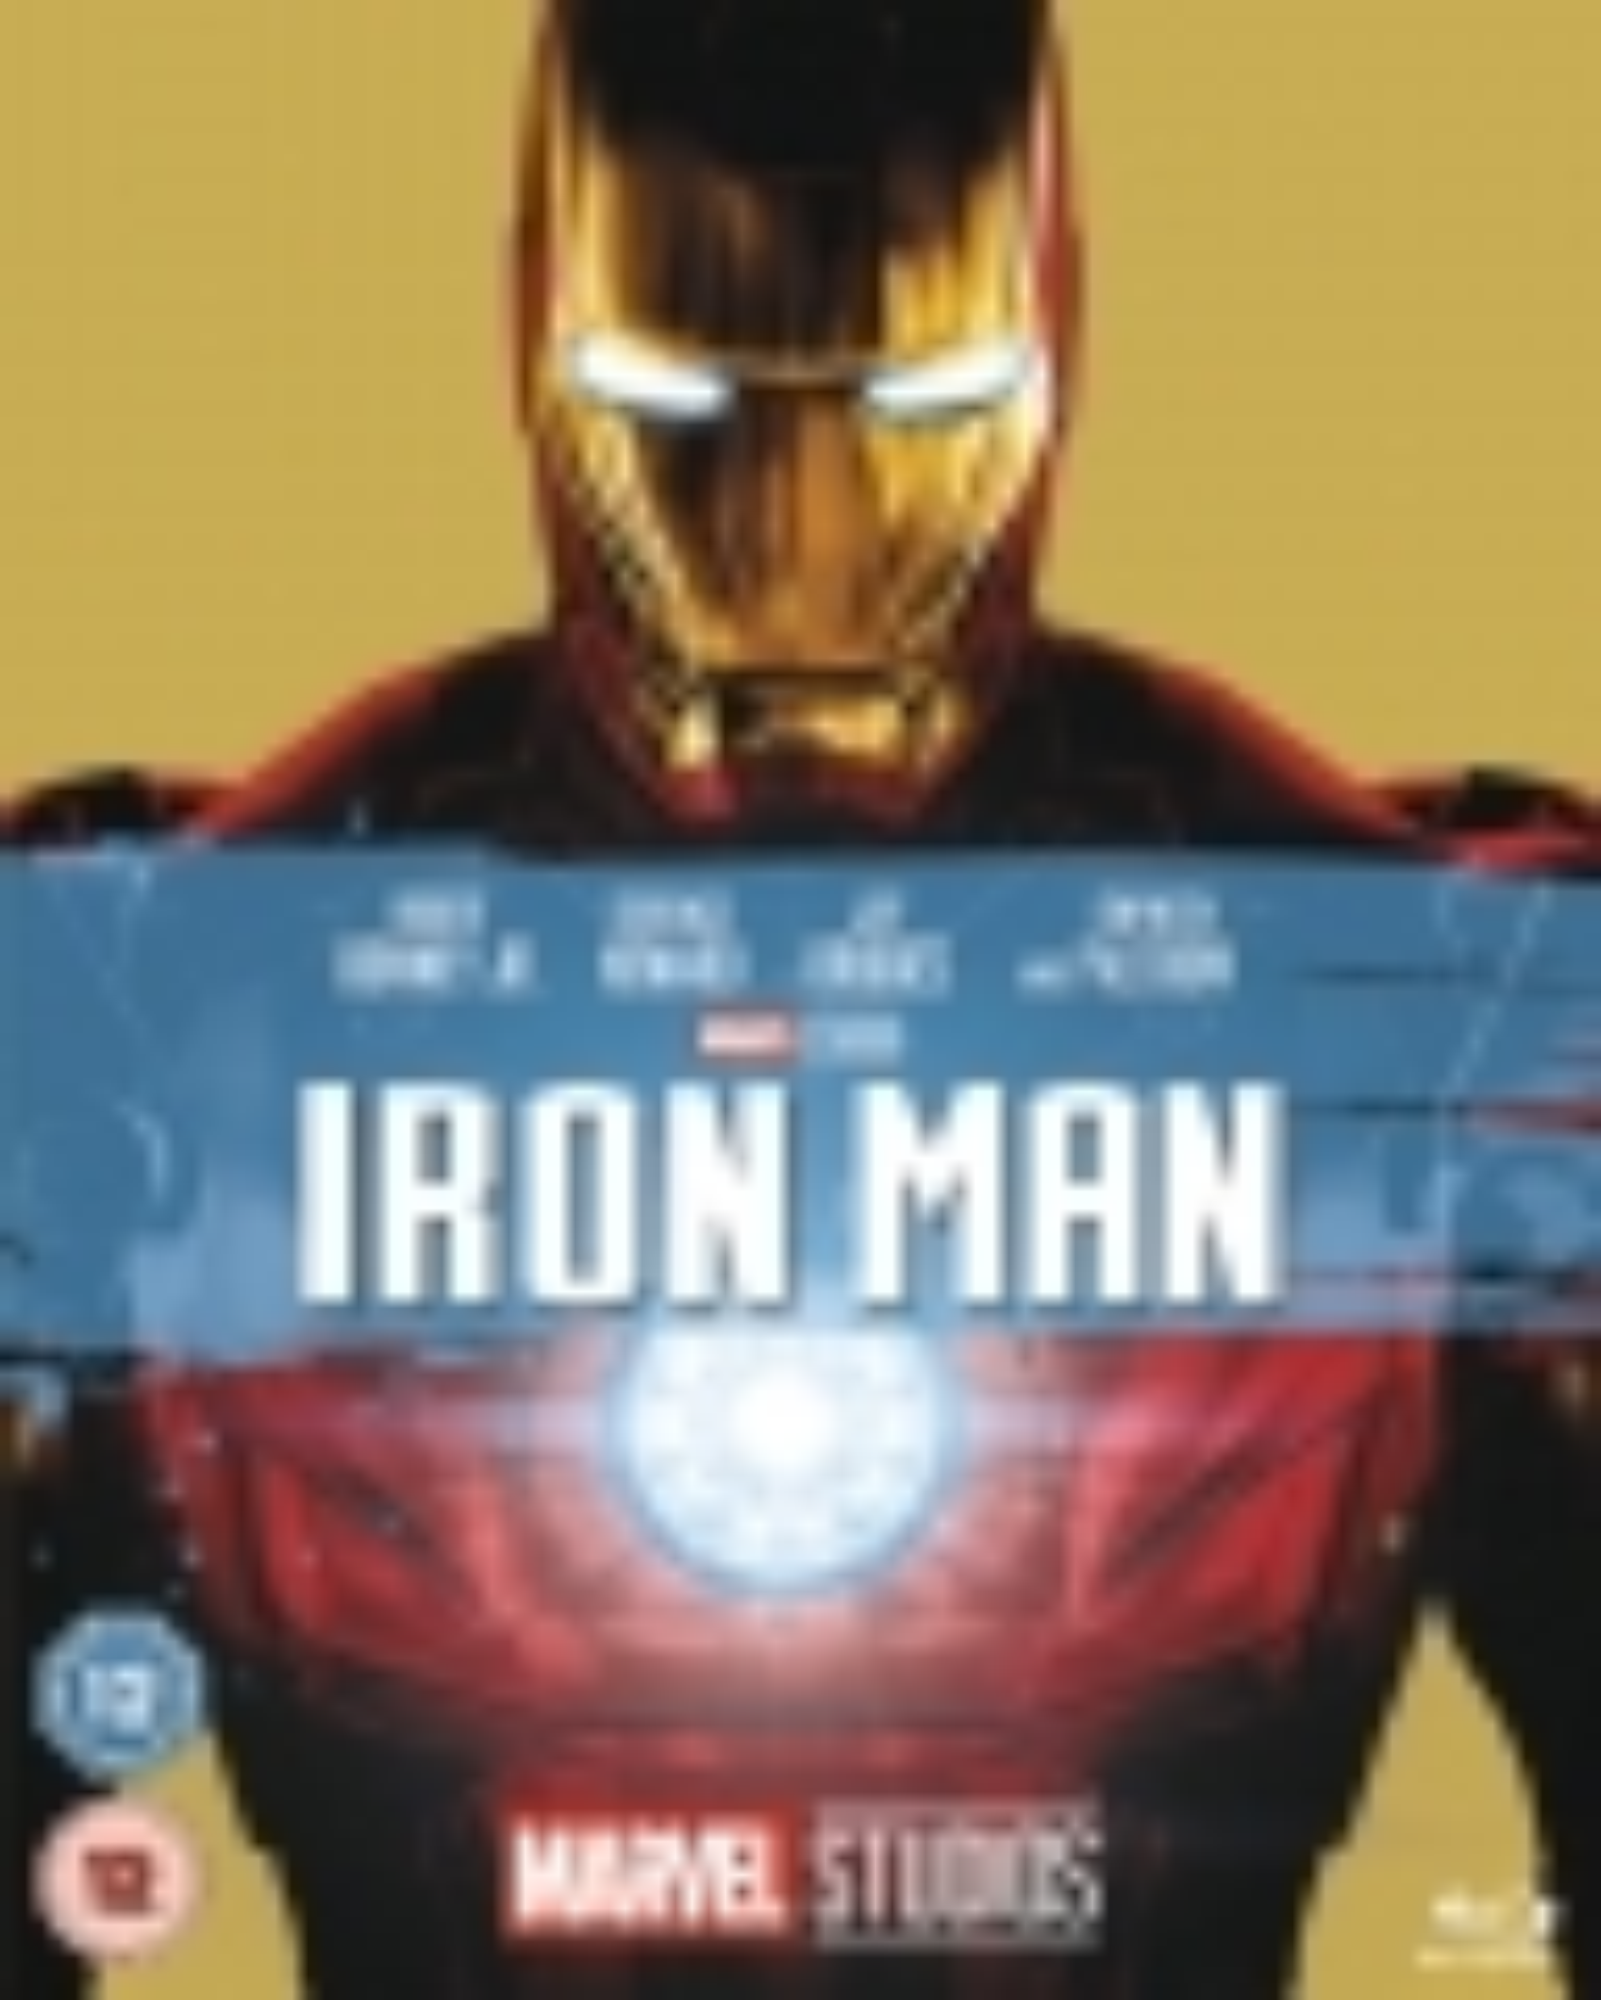 Marvel Cinematic Universe film 1 - Iron Man